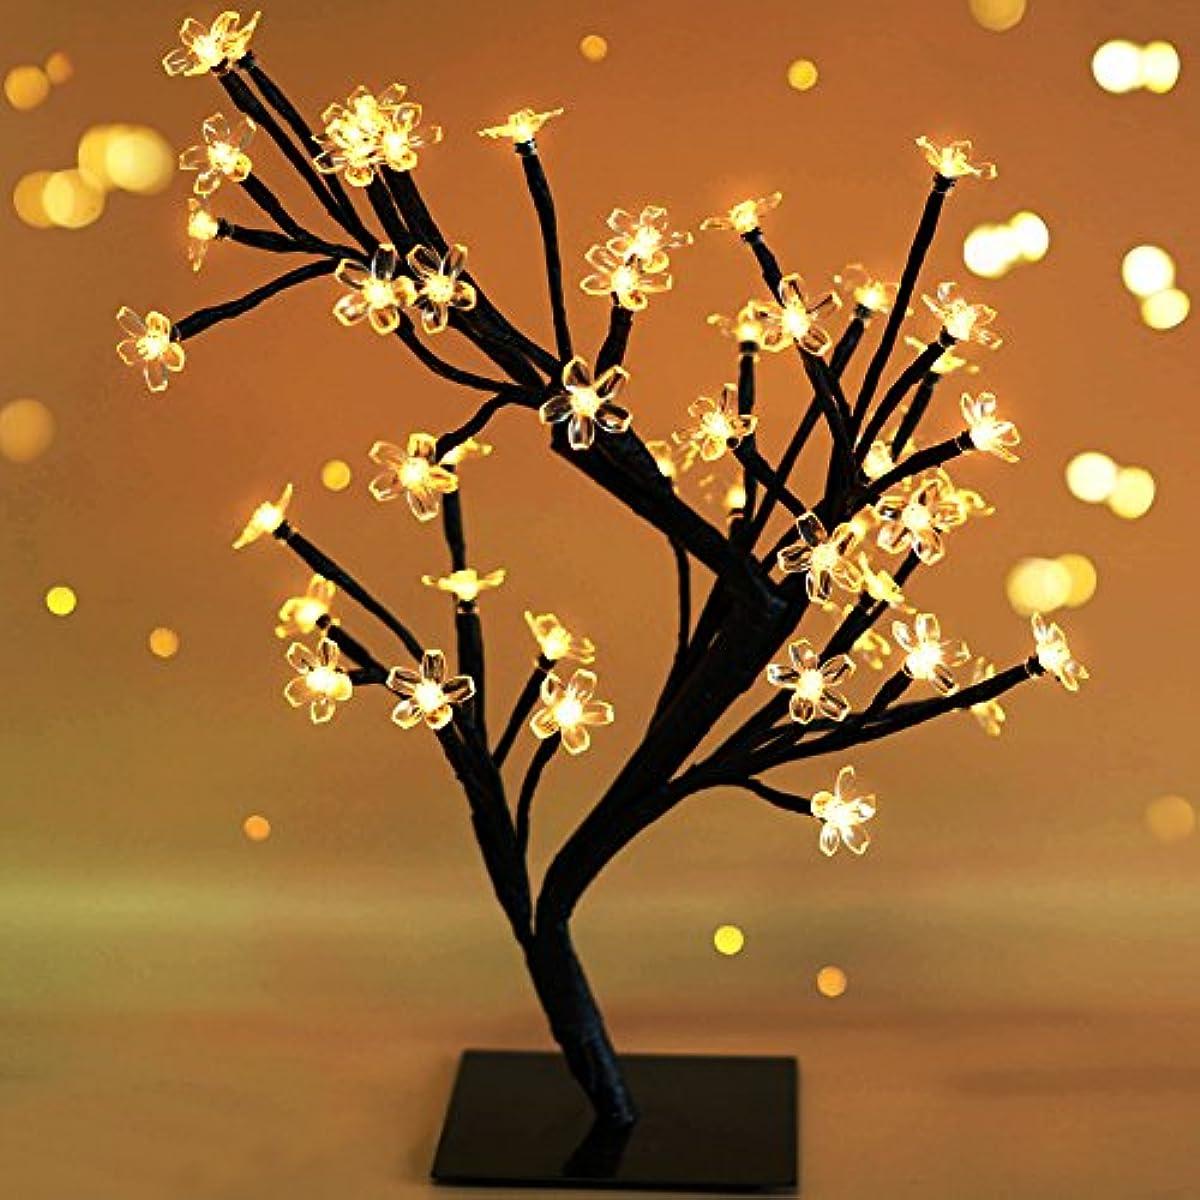 Lighting Strings 48 Led Battery Powered Plum Blossom Potted Plant Tree Light Christmas Day Decoration Night Light